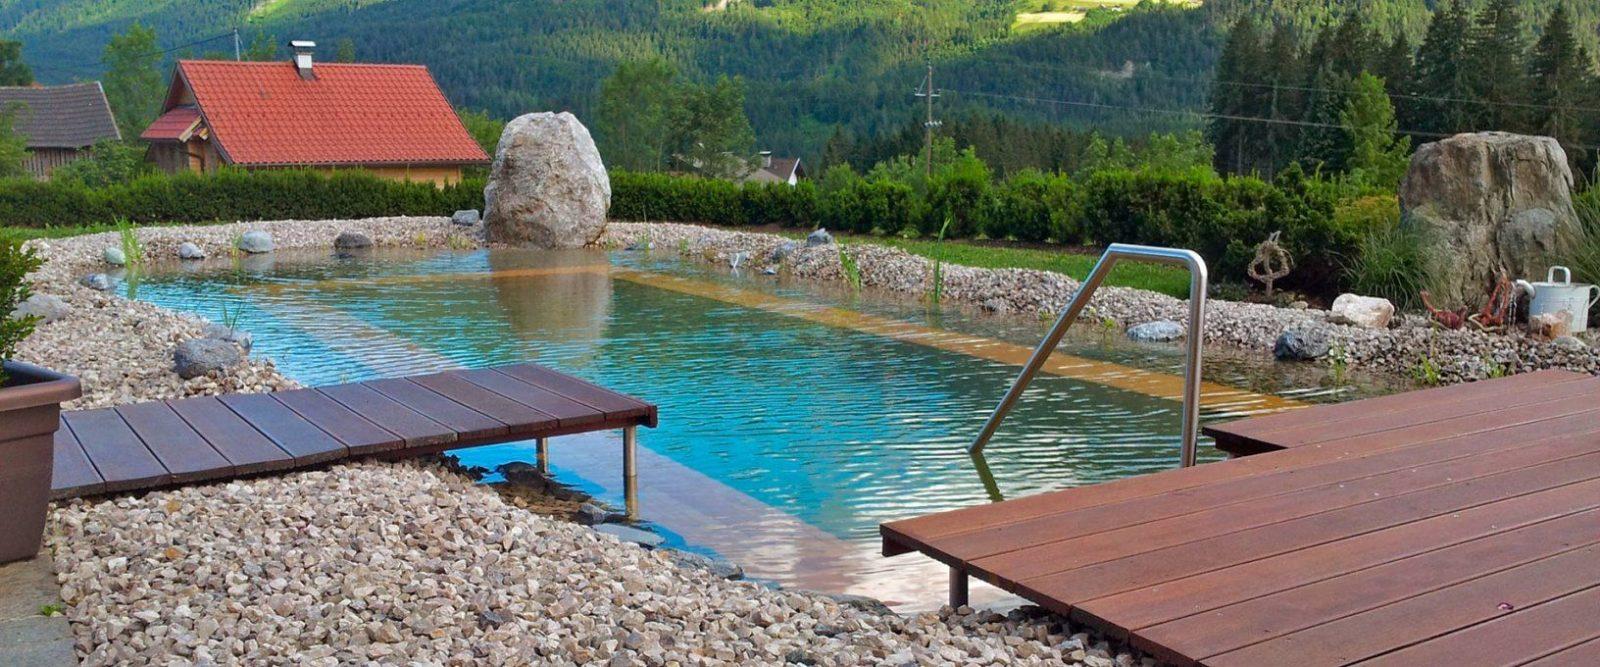 Holc Naturpool Swimmingpool Aus Holz Einbauen von Poolabdeckung Aus Holz Selber Bauen Photo